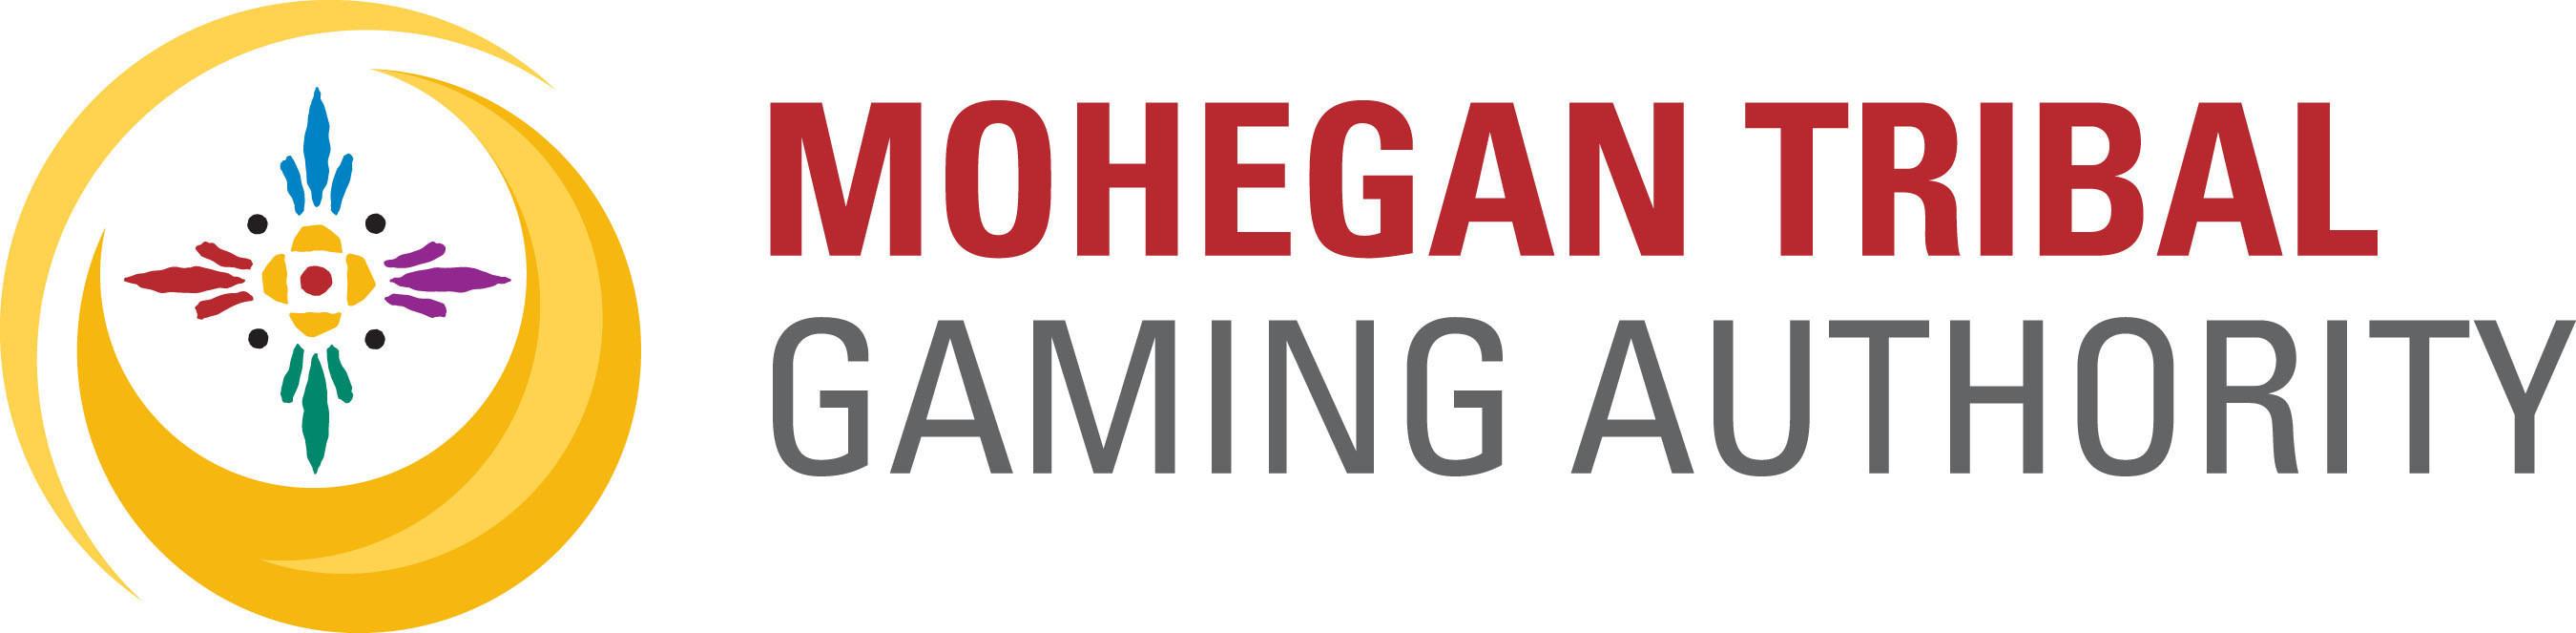 Mohegan Tribal Gaming Authority